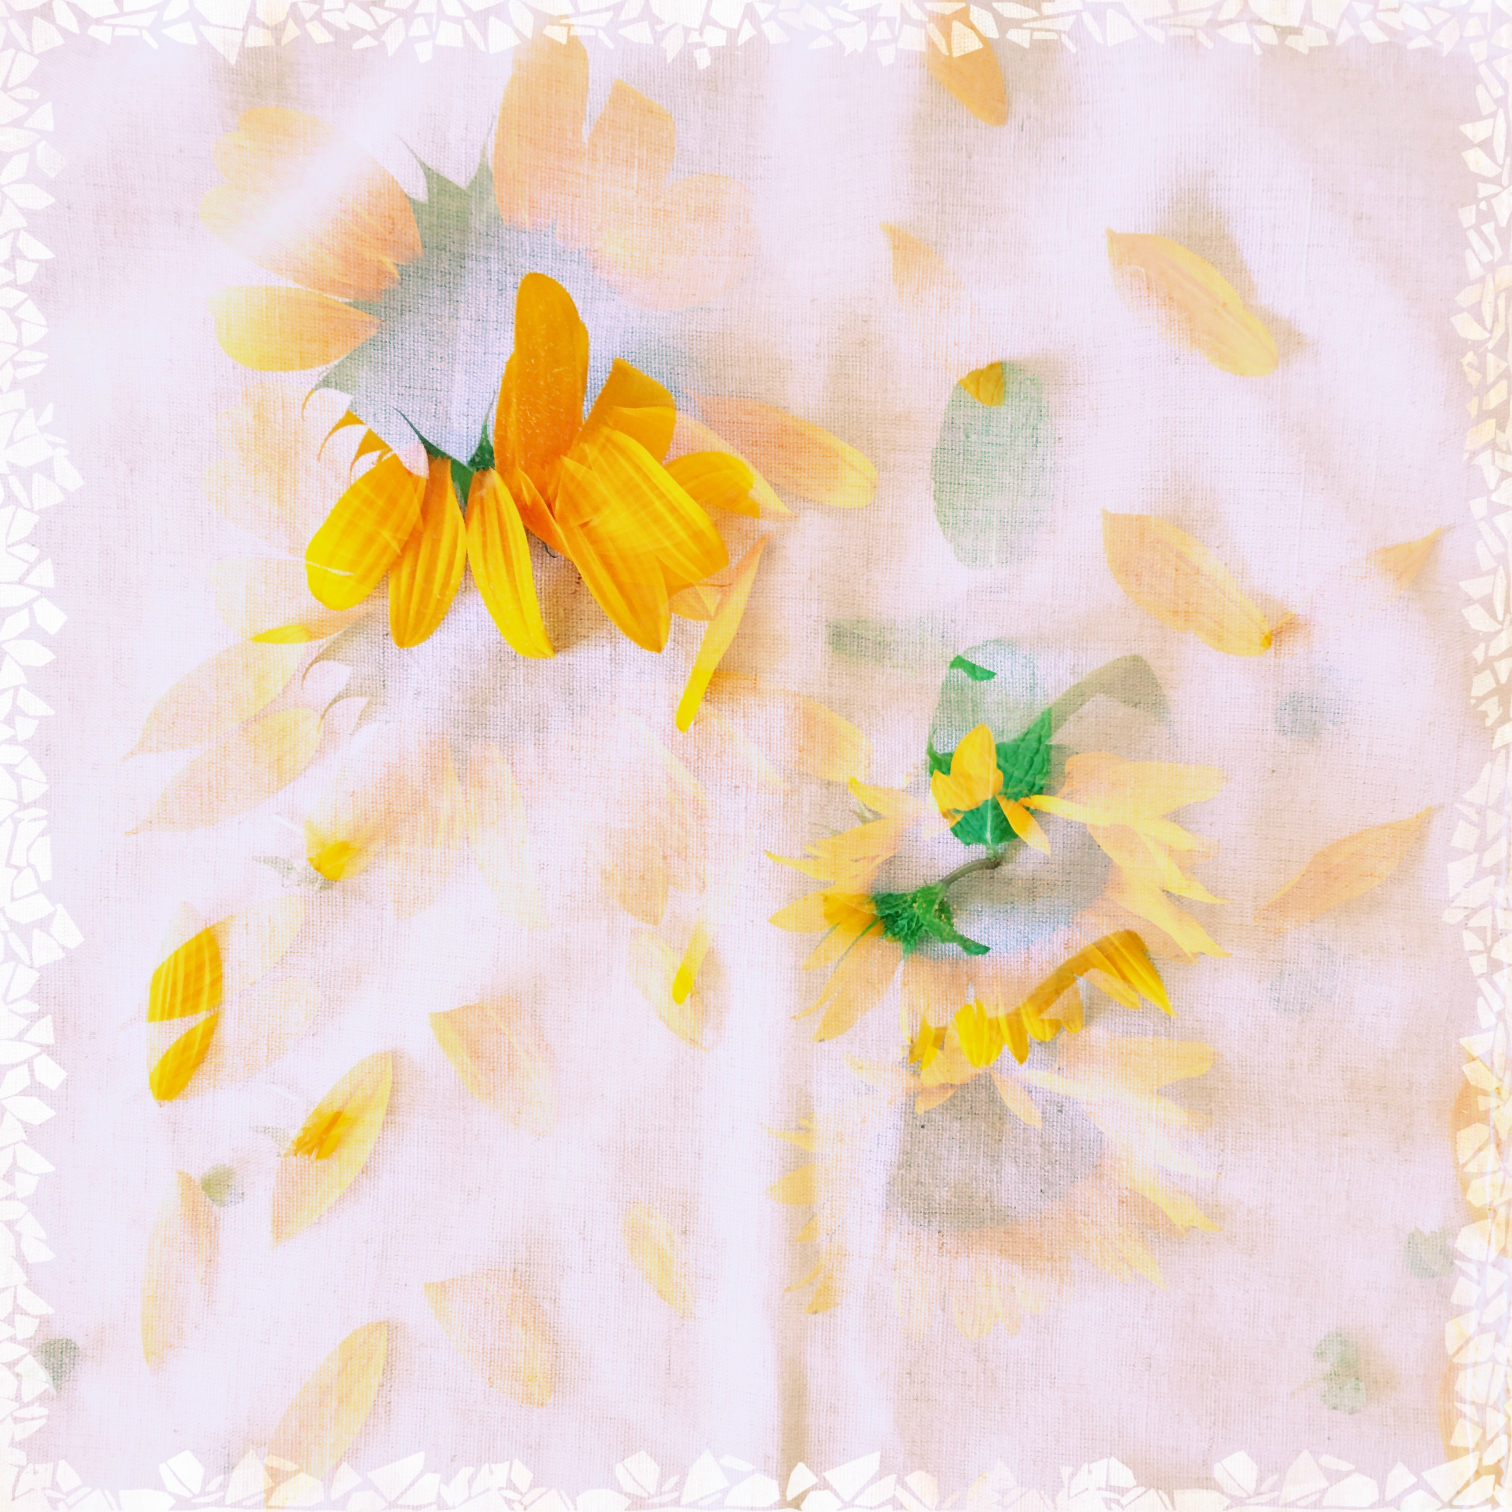 ©Artful Sunflower by Dena T Bray